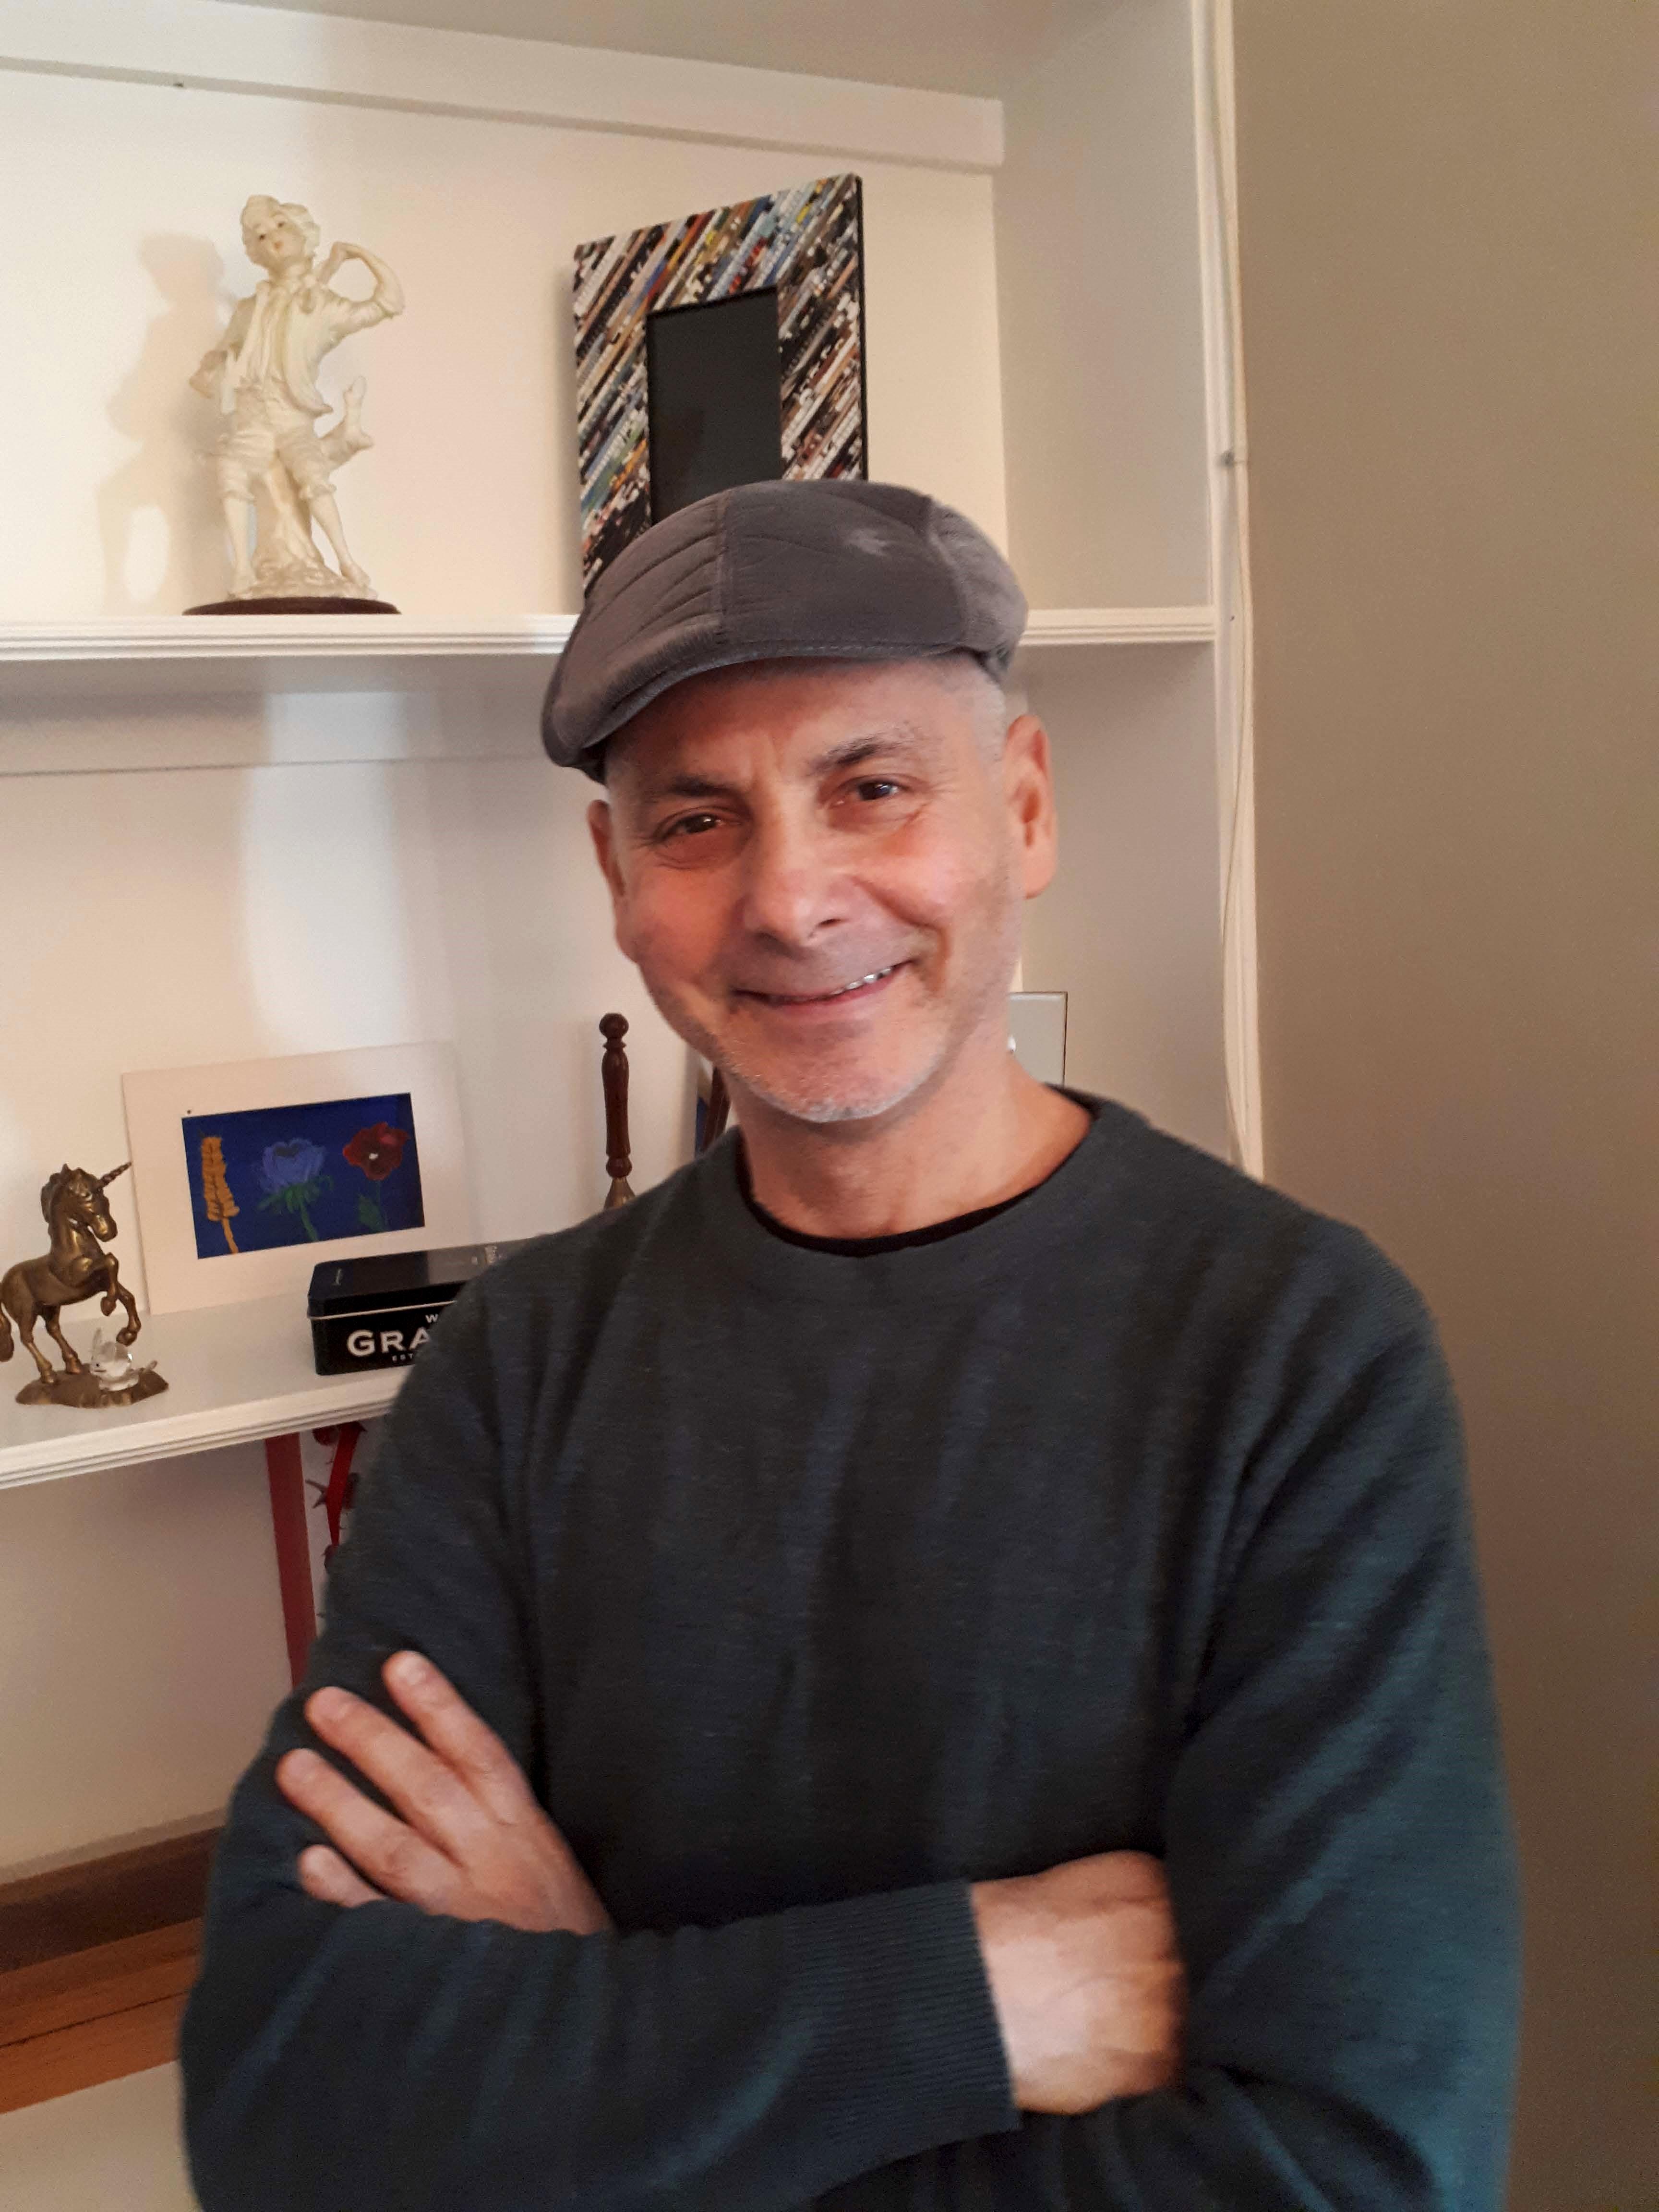 Orlando Pereira